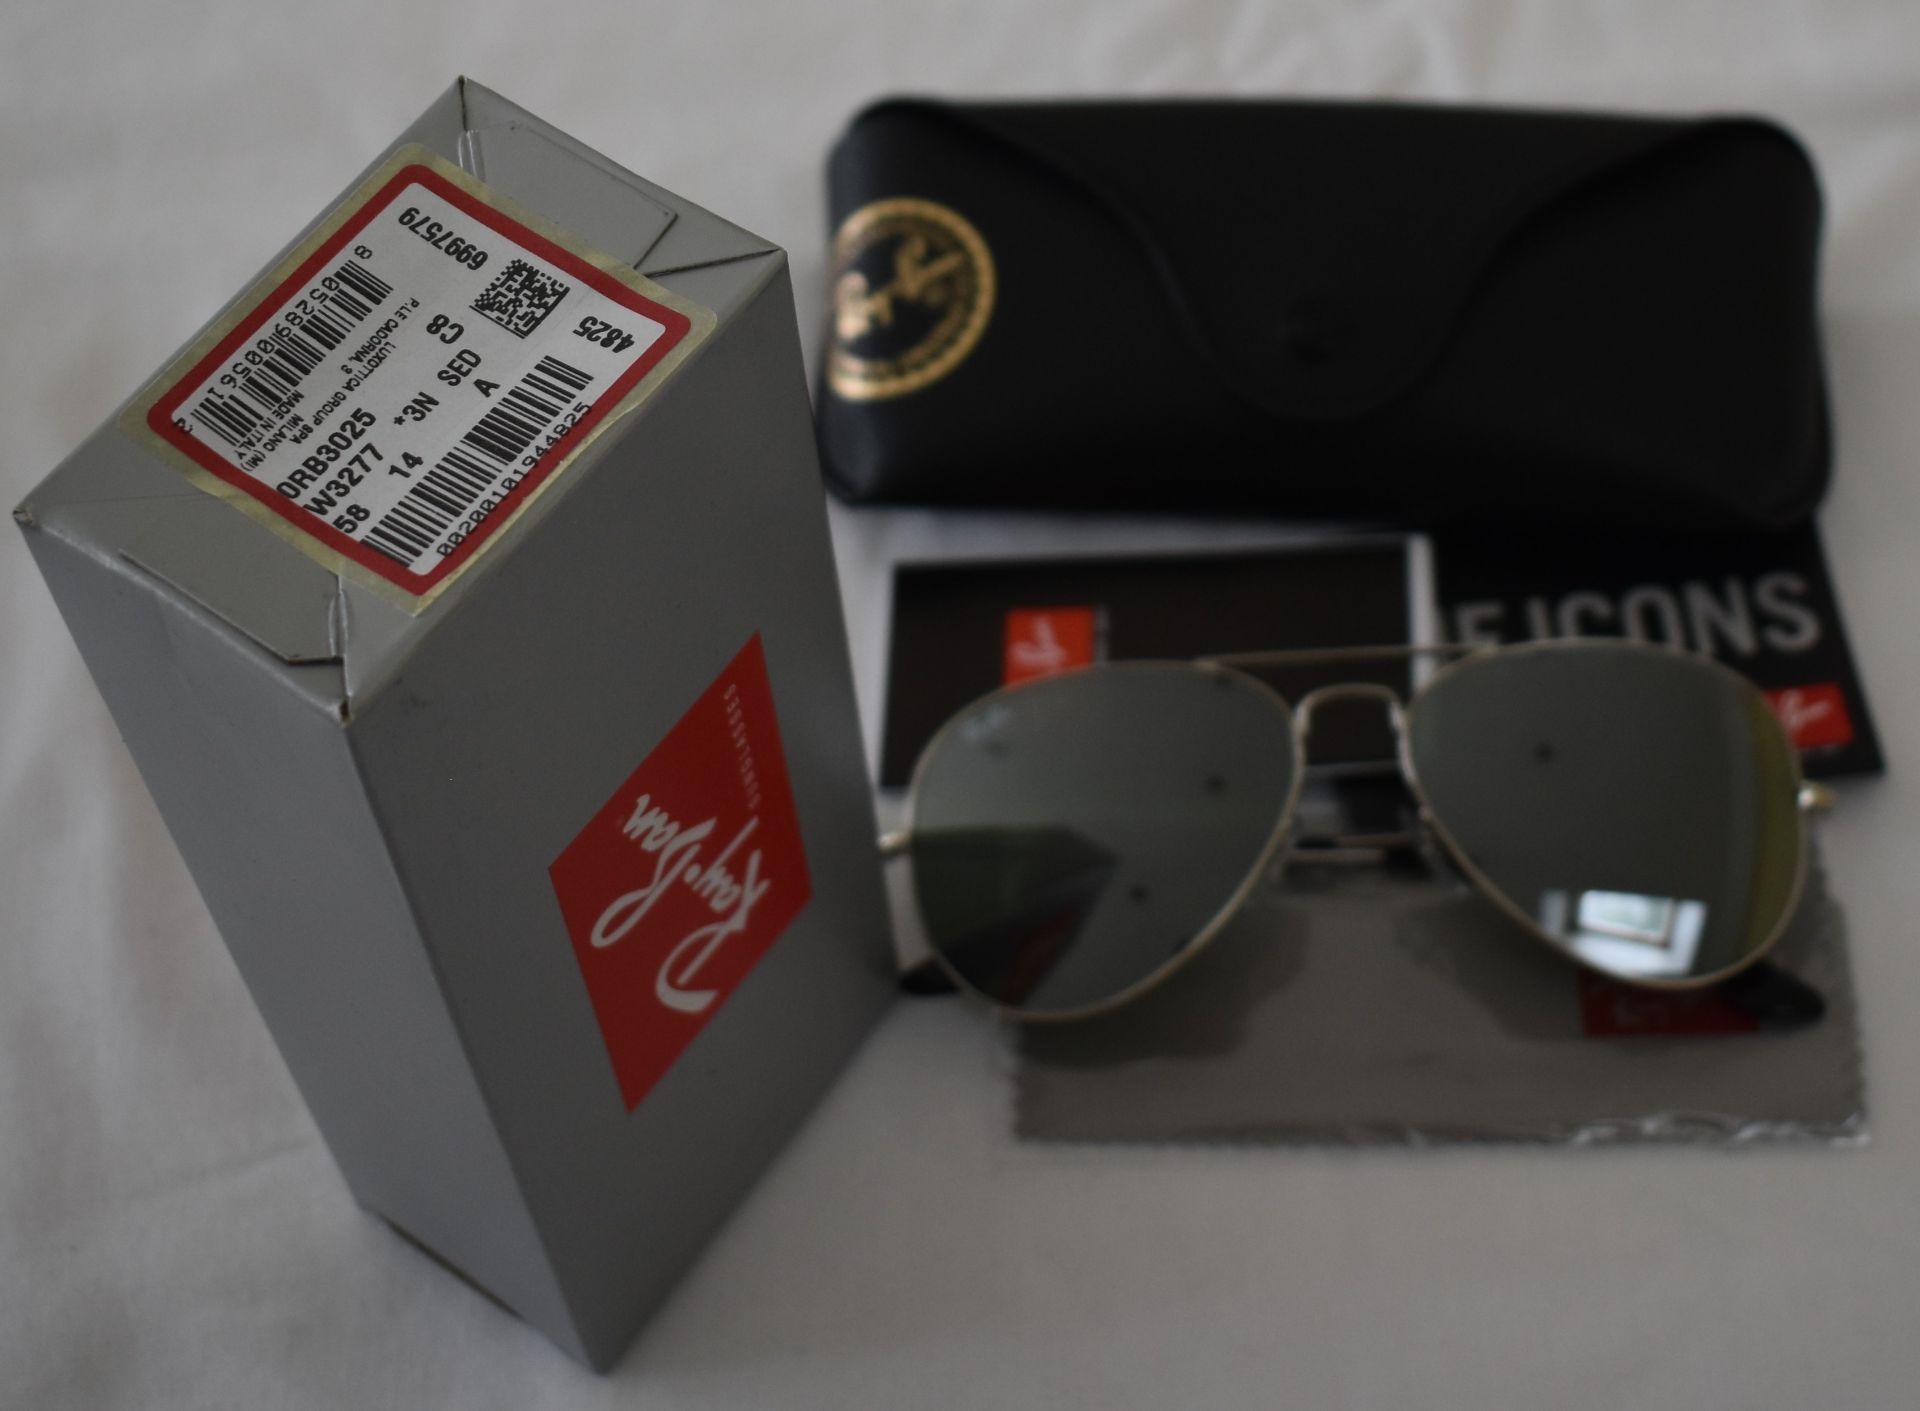 Ray Ban Sunglasses ORB3025 W3277 *3N - Image 2 of 2